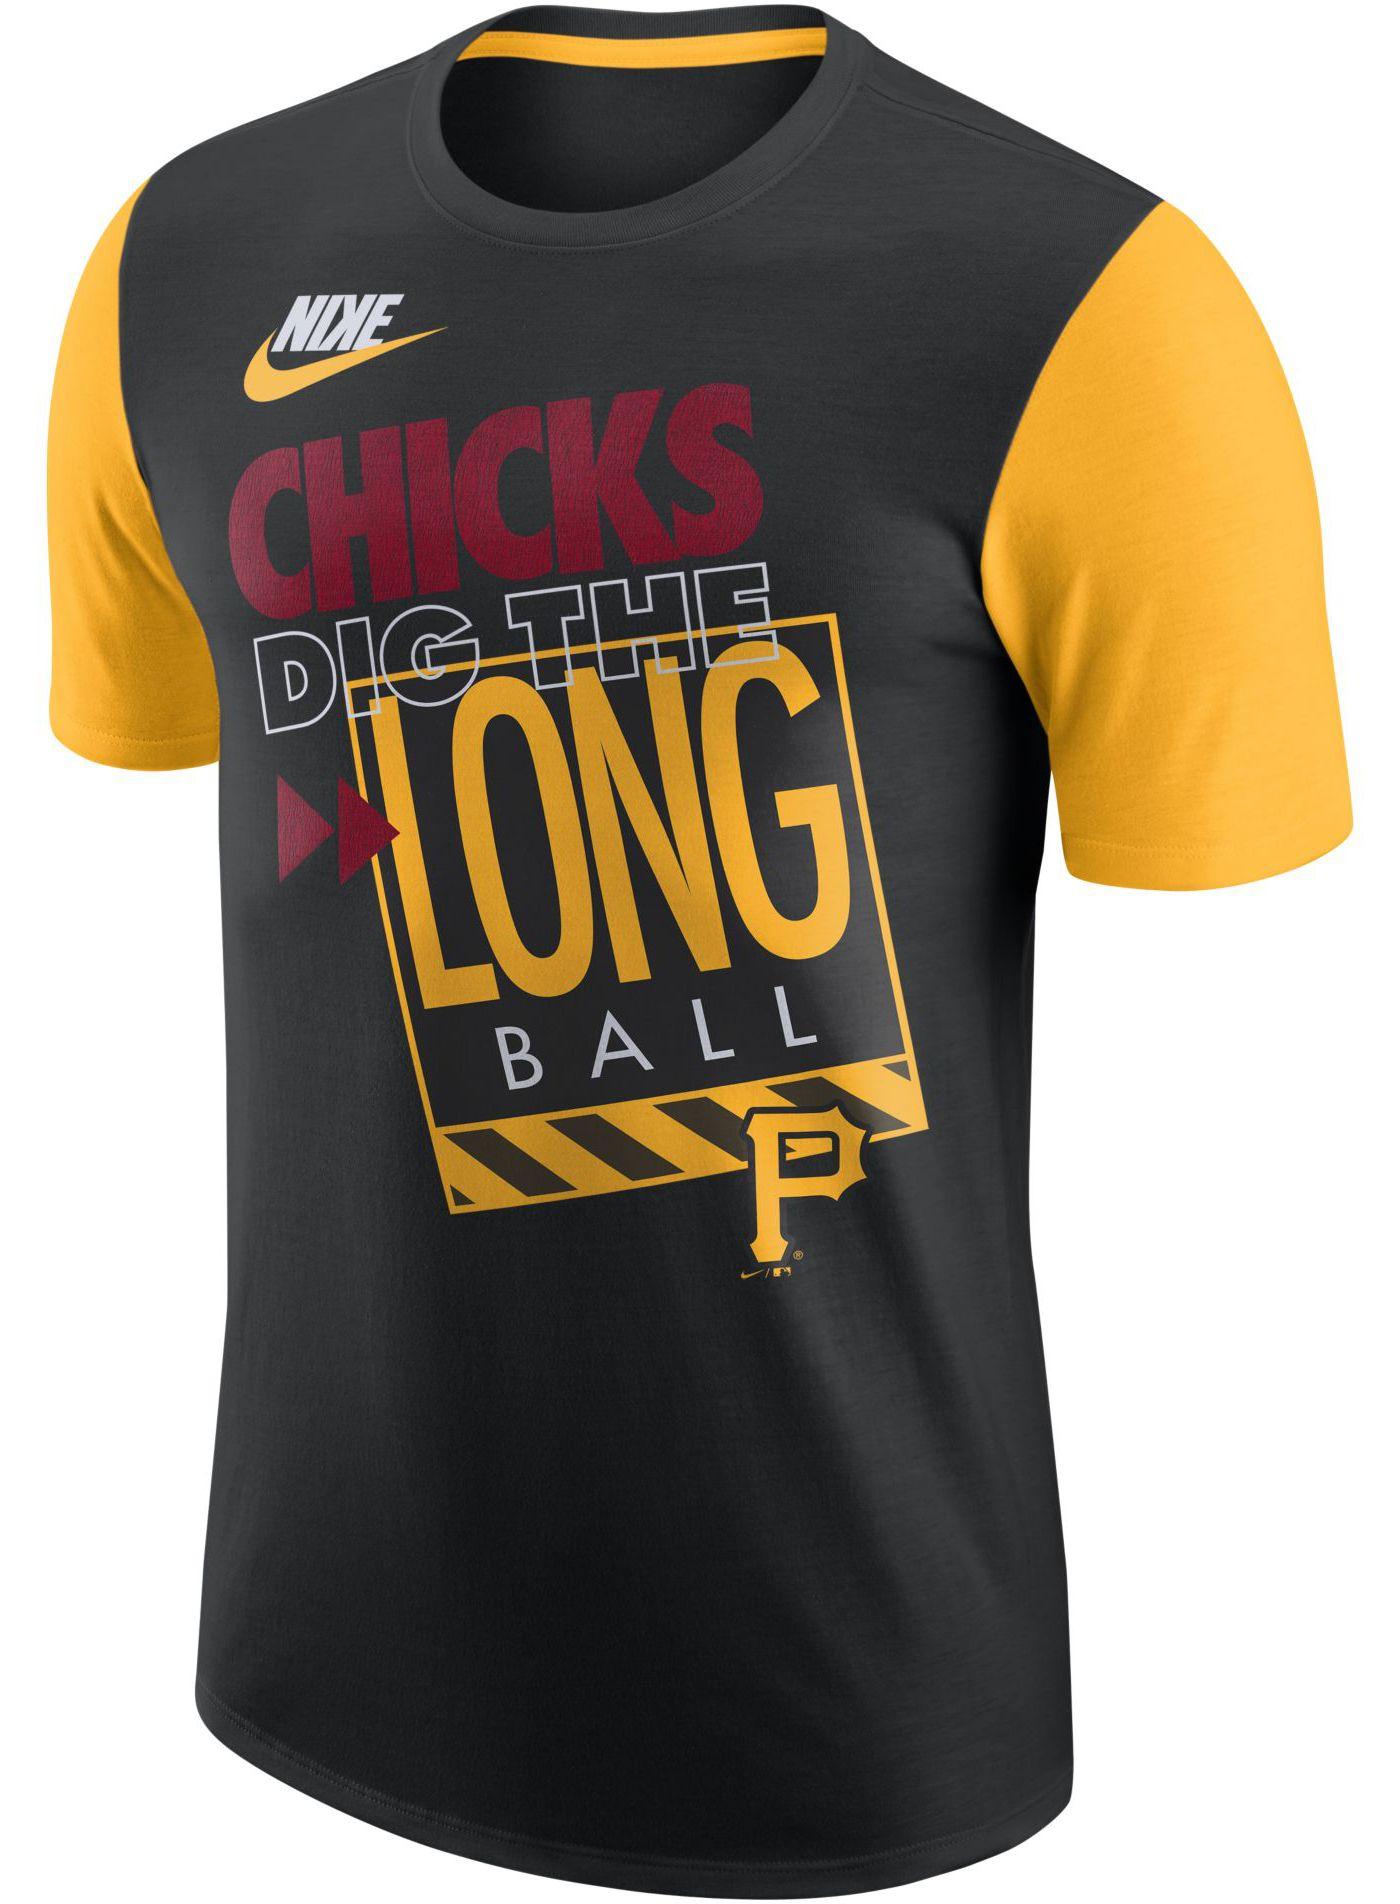 Nike Men's Pittsburgh Pirates Dri-FIT ''Chicks Dig The Long Ball'' T-Shirt